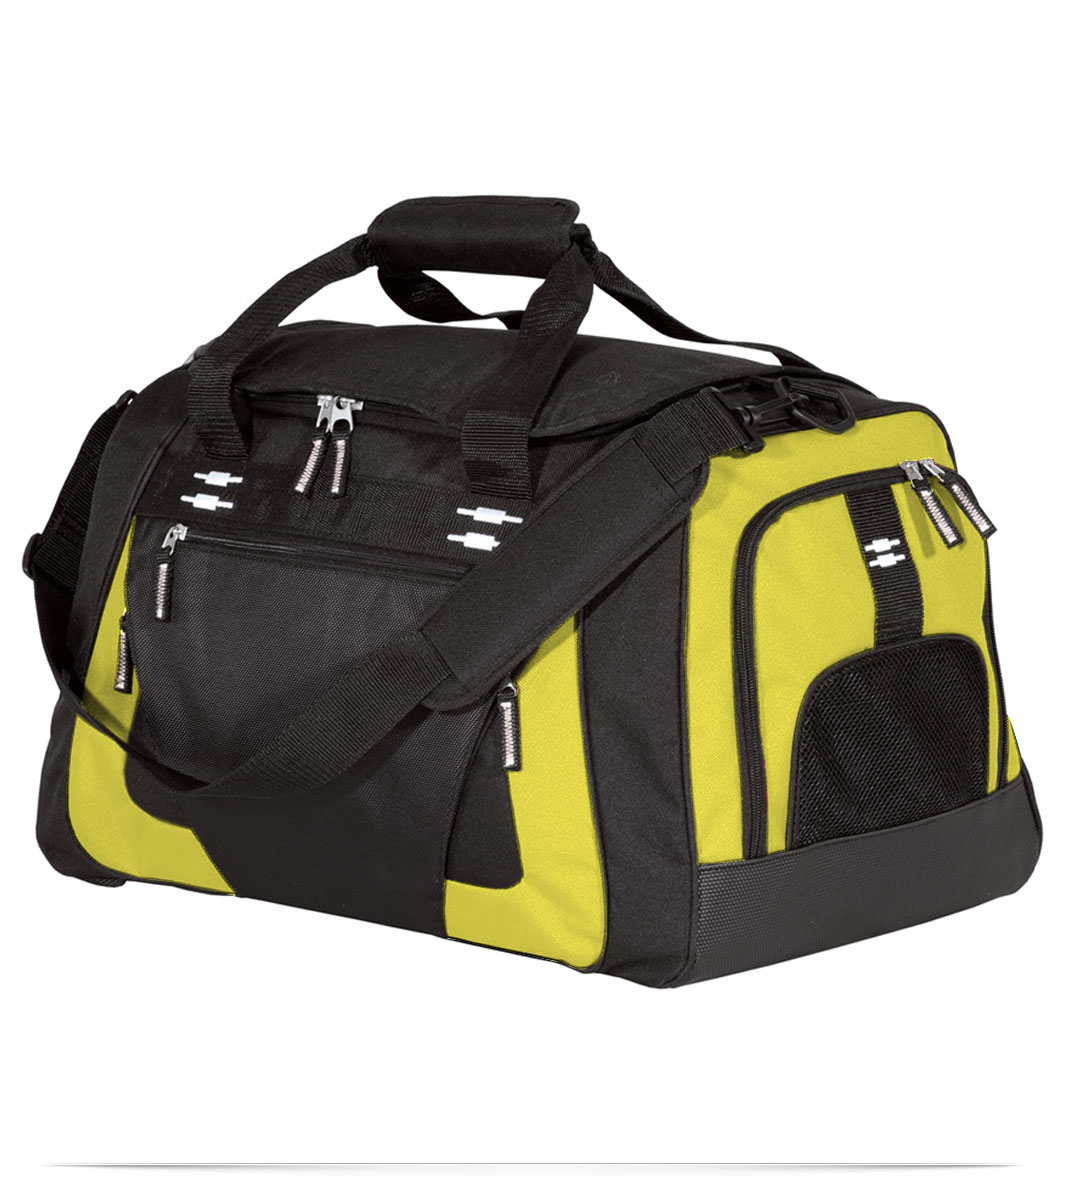 Customize Medium Size Duffel Bag